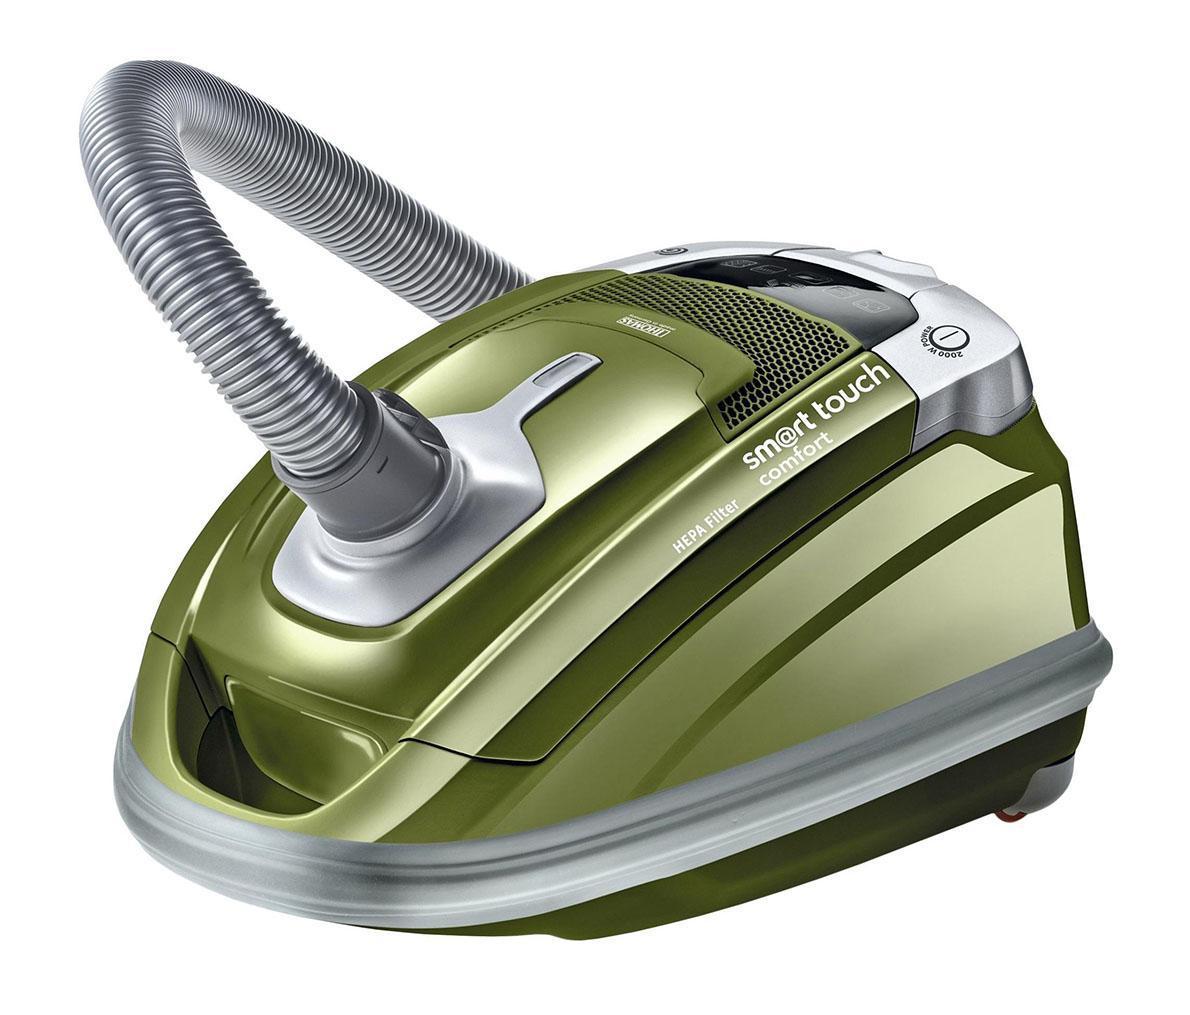 Thomas 784014 Smart Touch Comfort пылесос